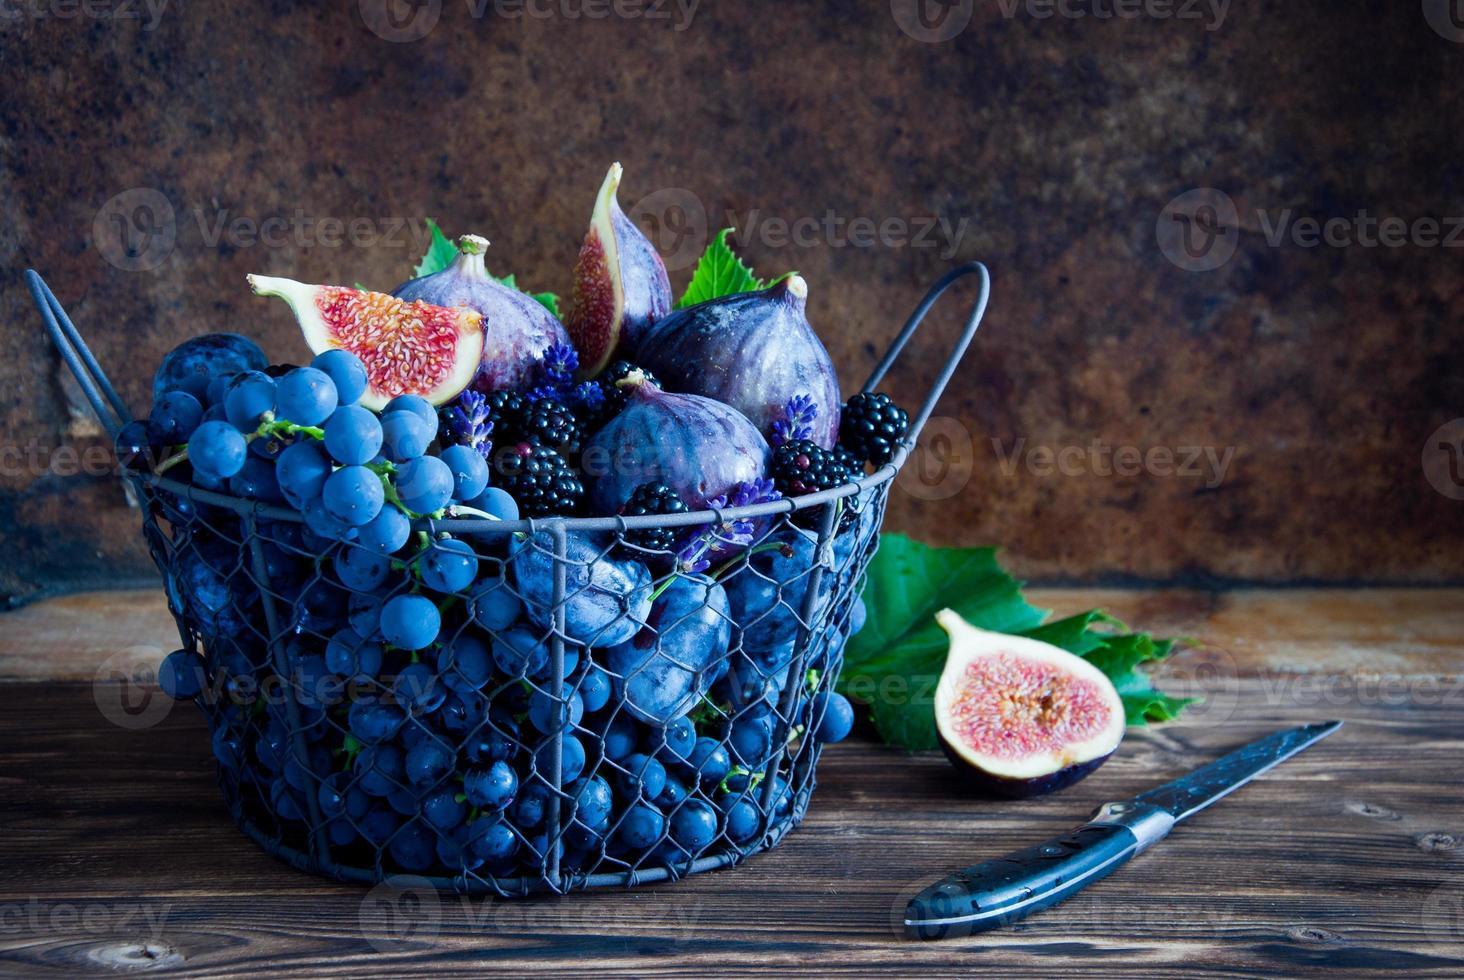 higos frescos, uvas, ciruelas pasas y zarzamora foto